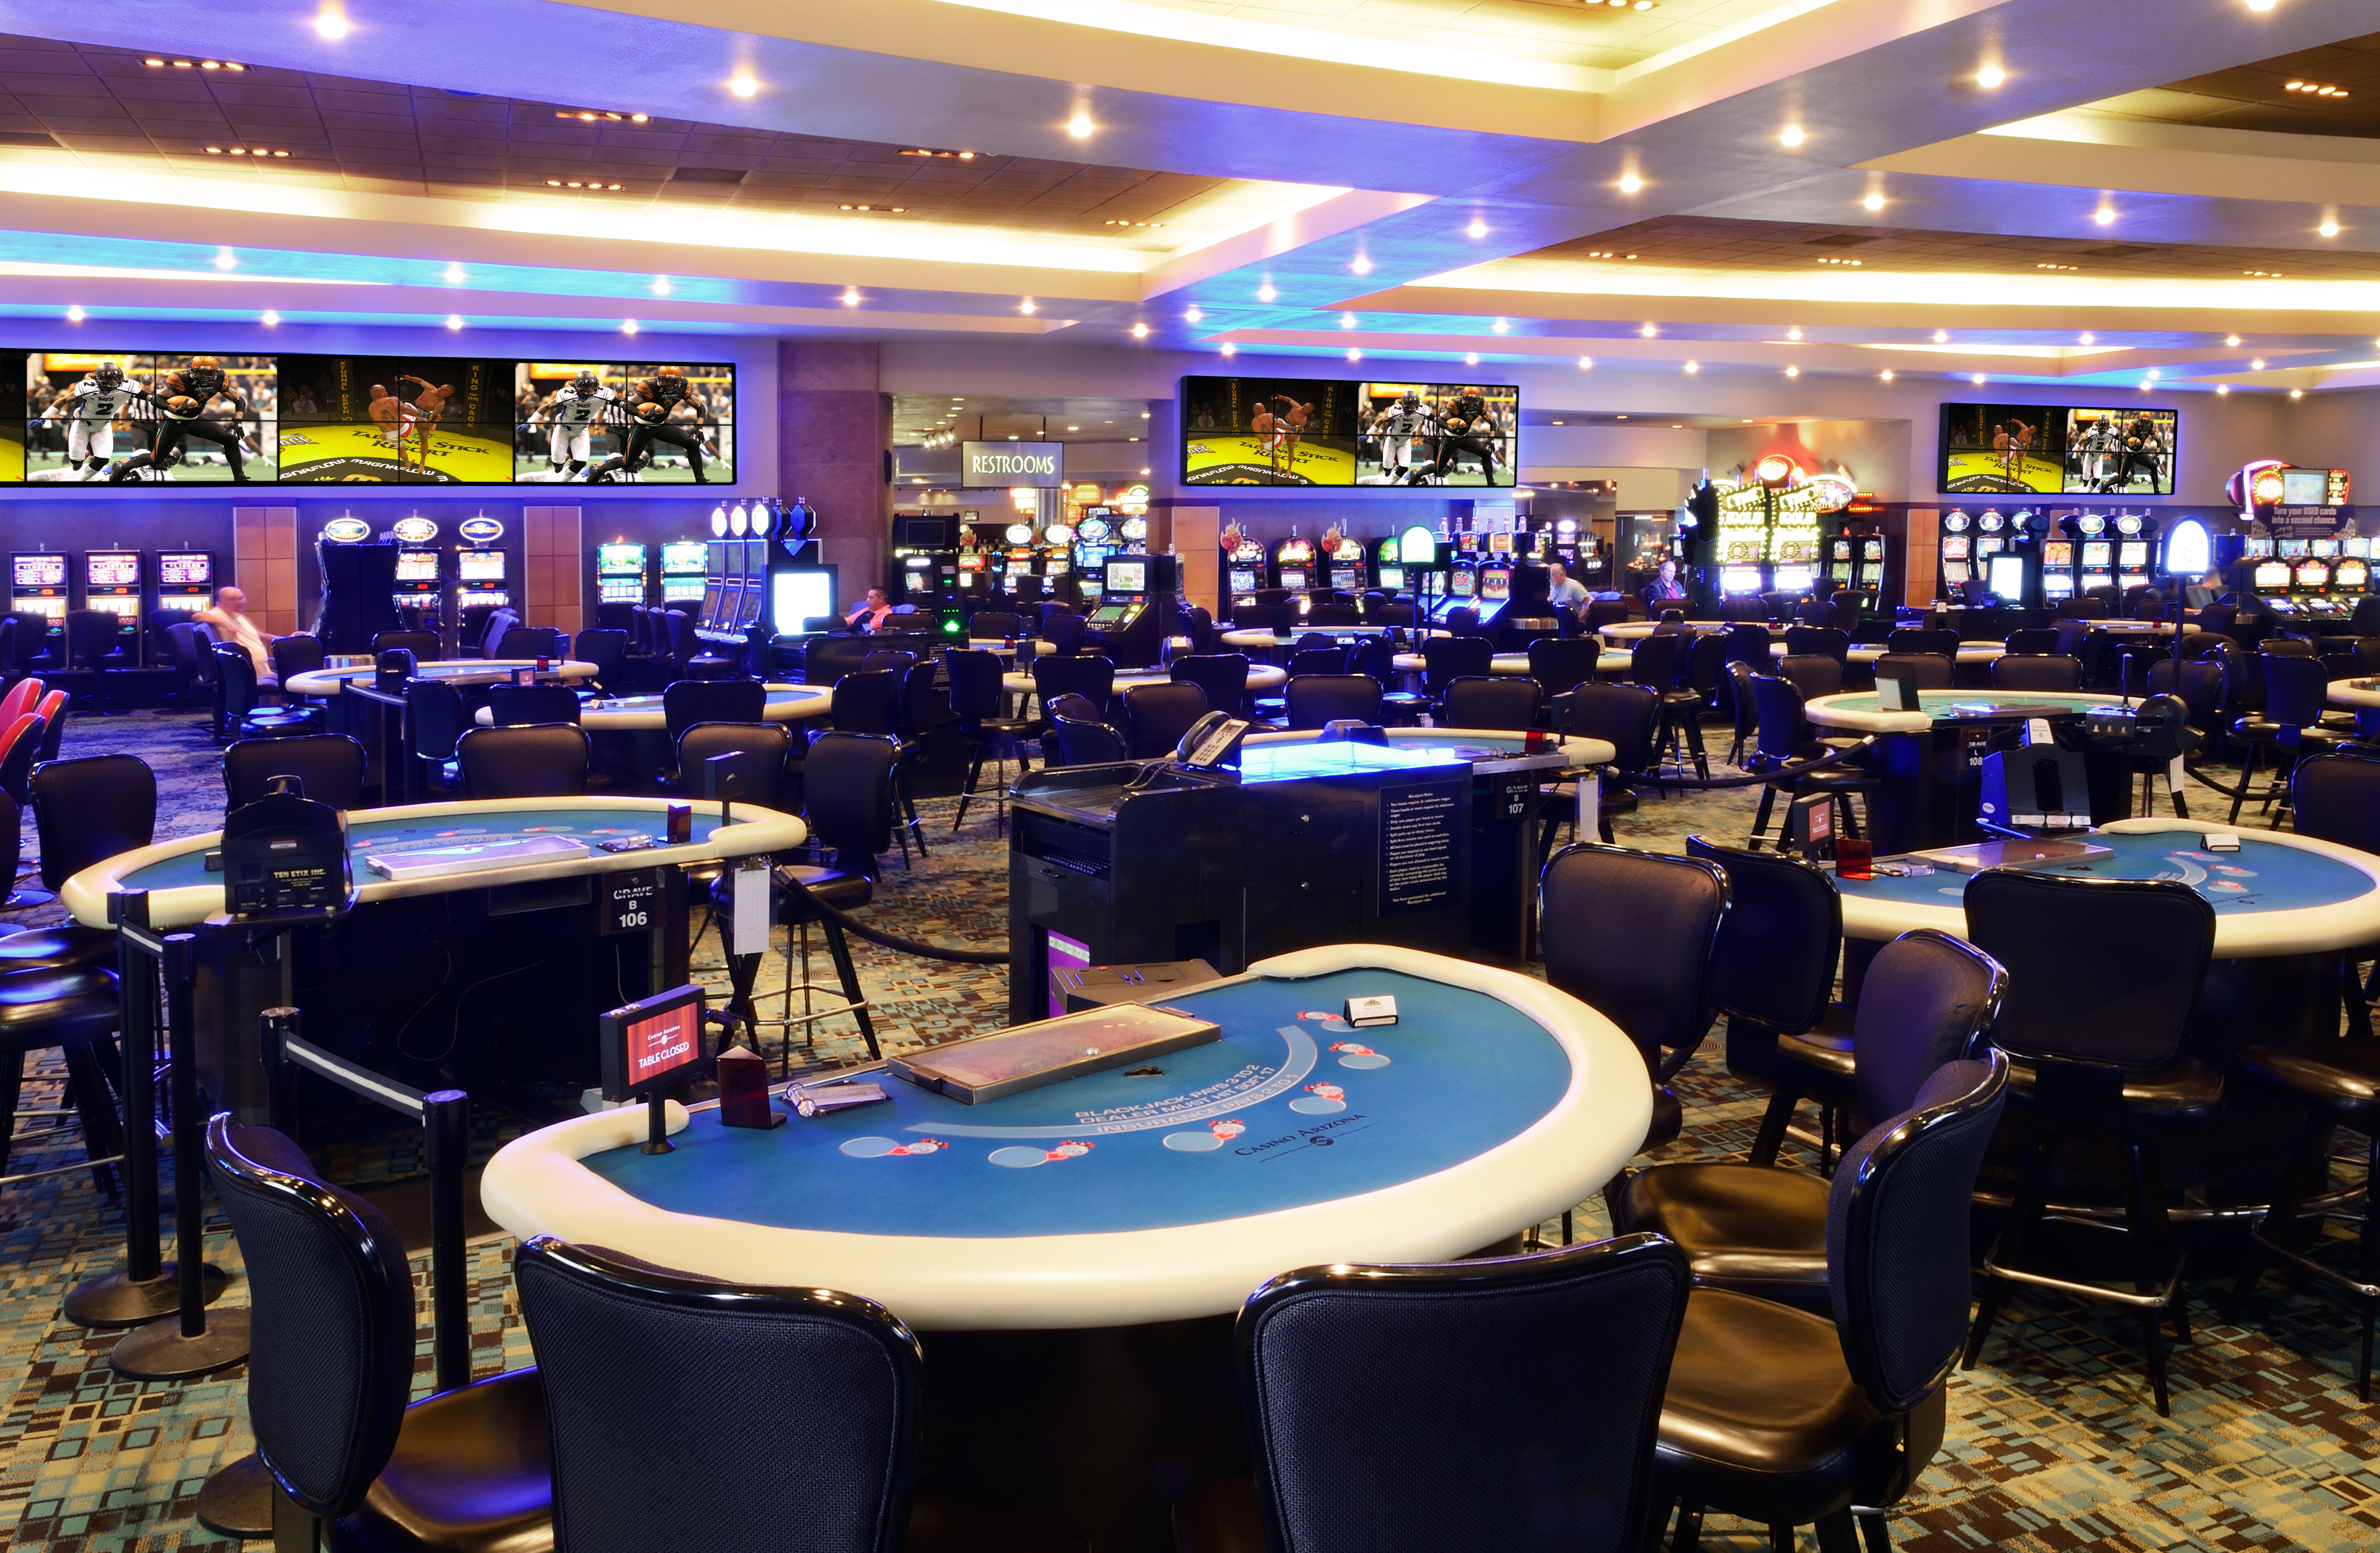 Casino arizona address sun cruz casino boat charleston